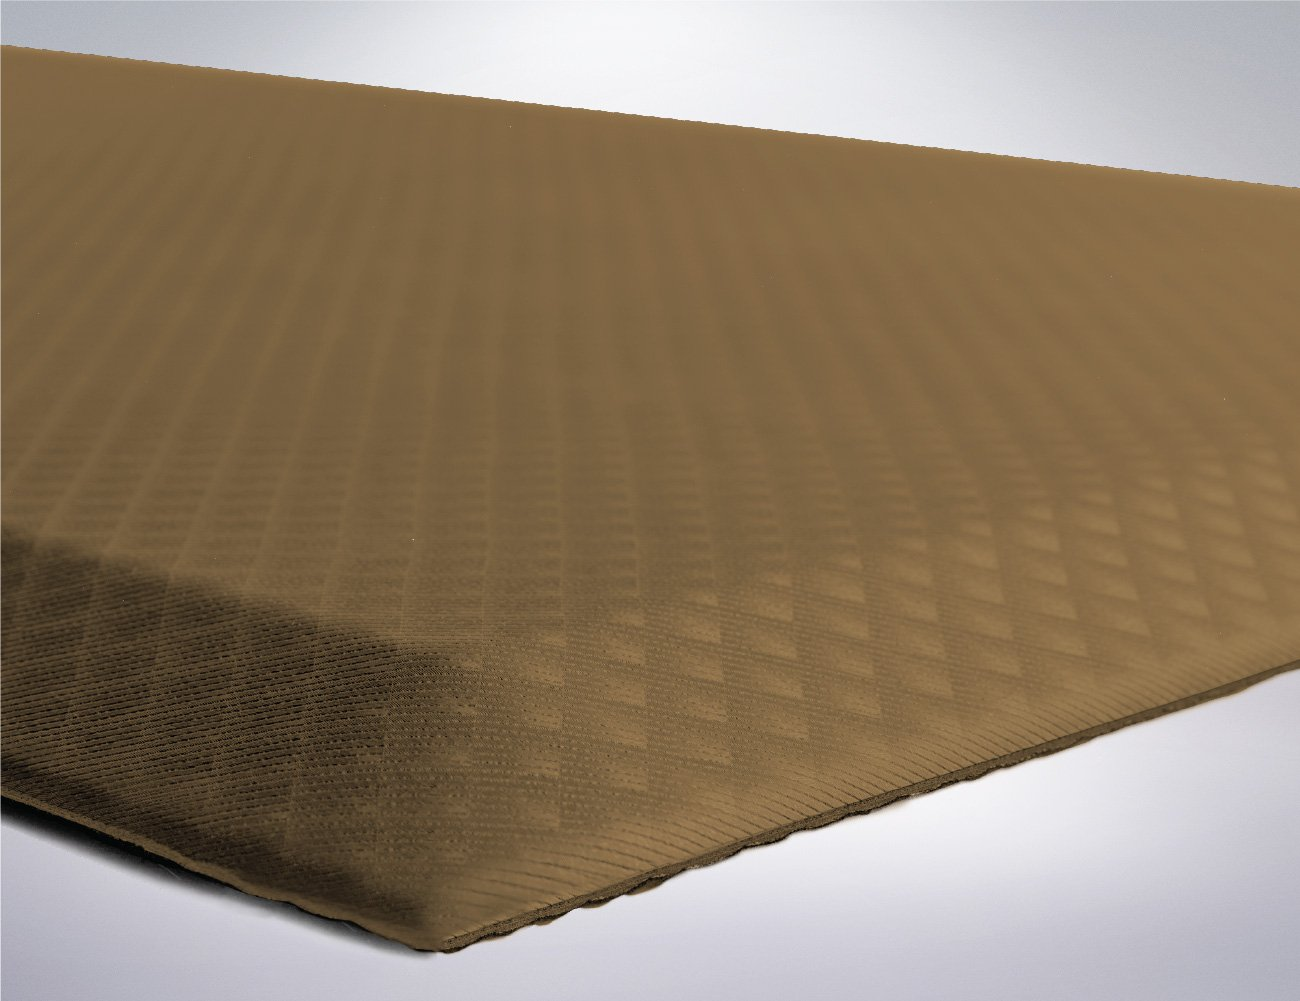 Kangaroo Brands Original 3/4'' Anti-Fatigue Comfort Standing Mat Kitchen Rug (70x24), Phthalate Free, Non-Toxic, Waterproof, Ergonomically Engineered Floor Pad, Rugs for Office Stand Up Desk (Sand)